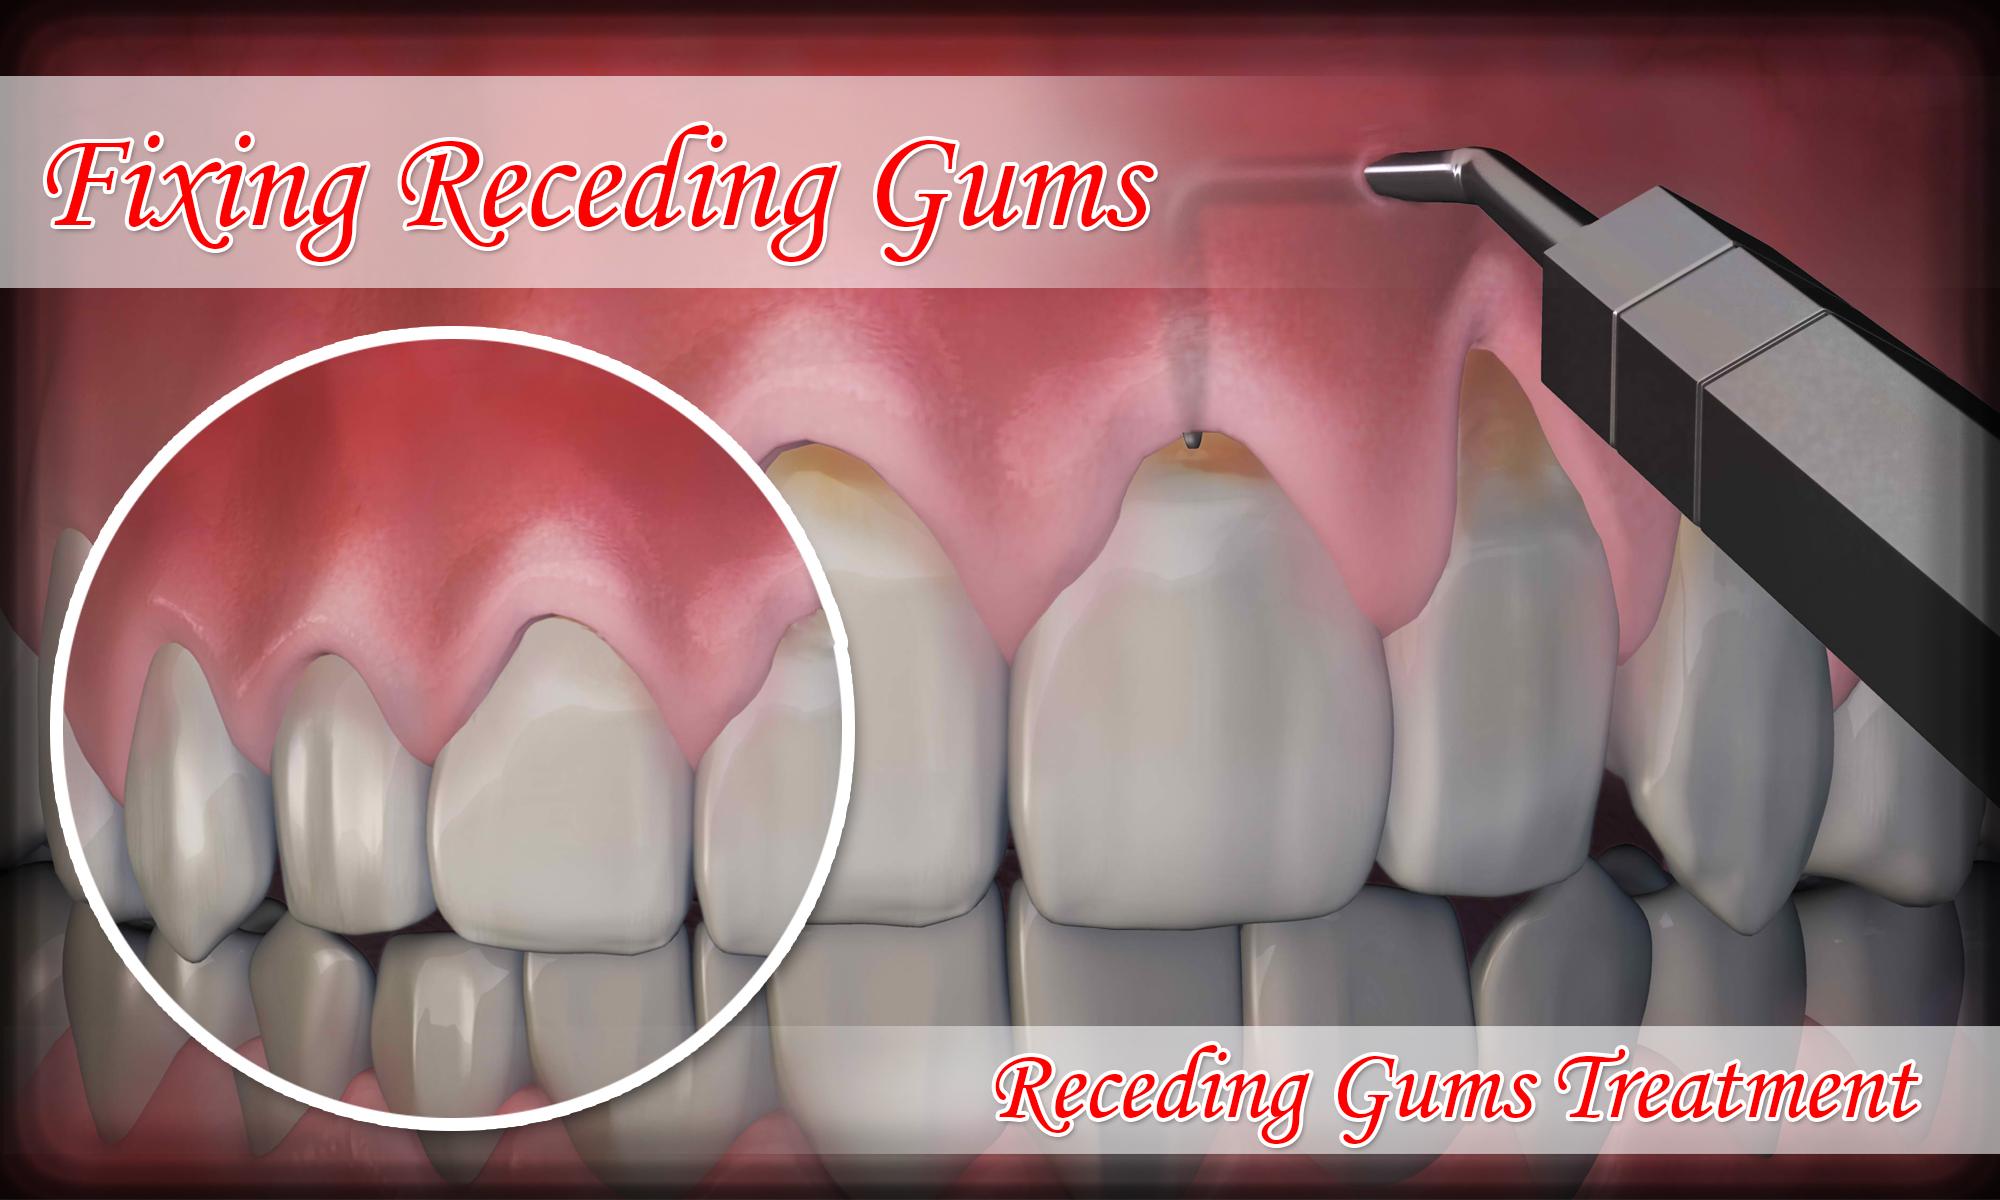 Fixing-Receding-Gums